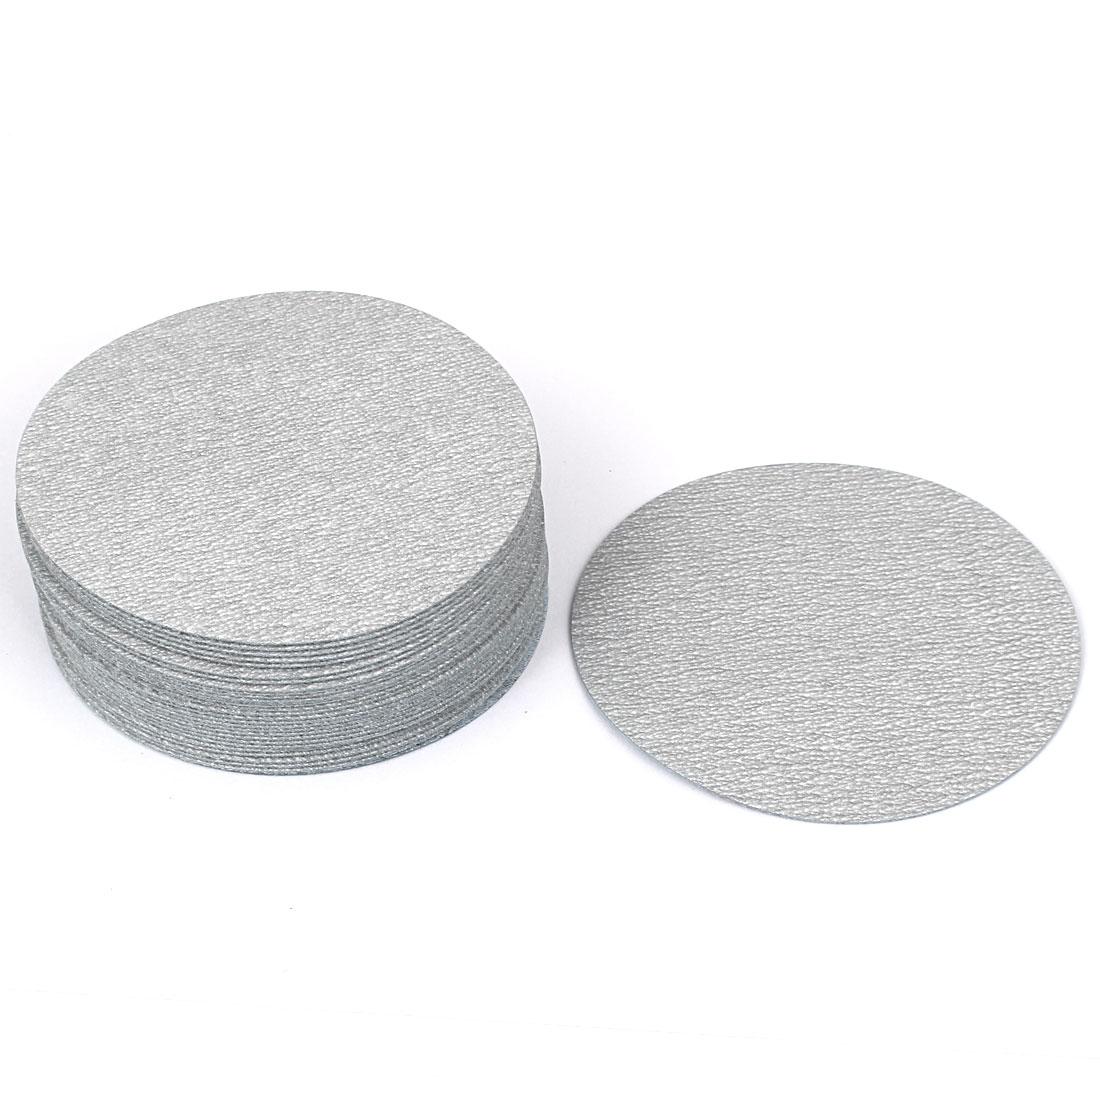 "4"" Dia Polishing Round Dry Abrasive Sanding Sandpaper Sheet Disc 600 Grit 30pcs"